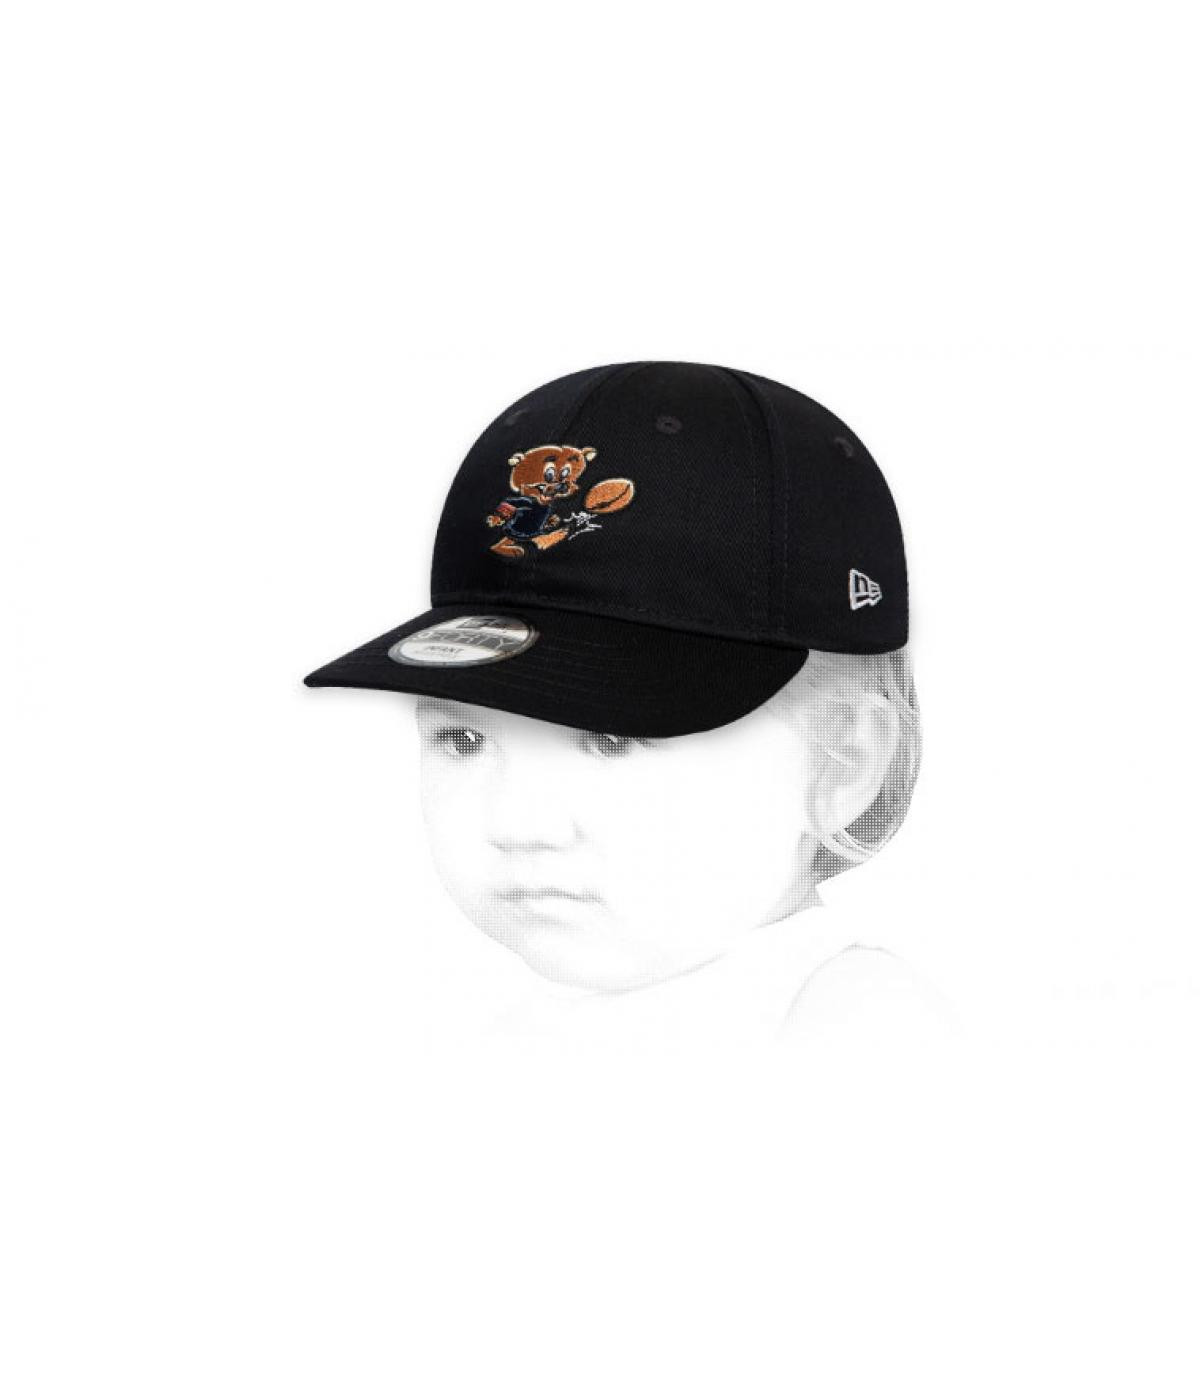 Berretto da bambino nero Bears